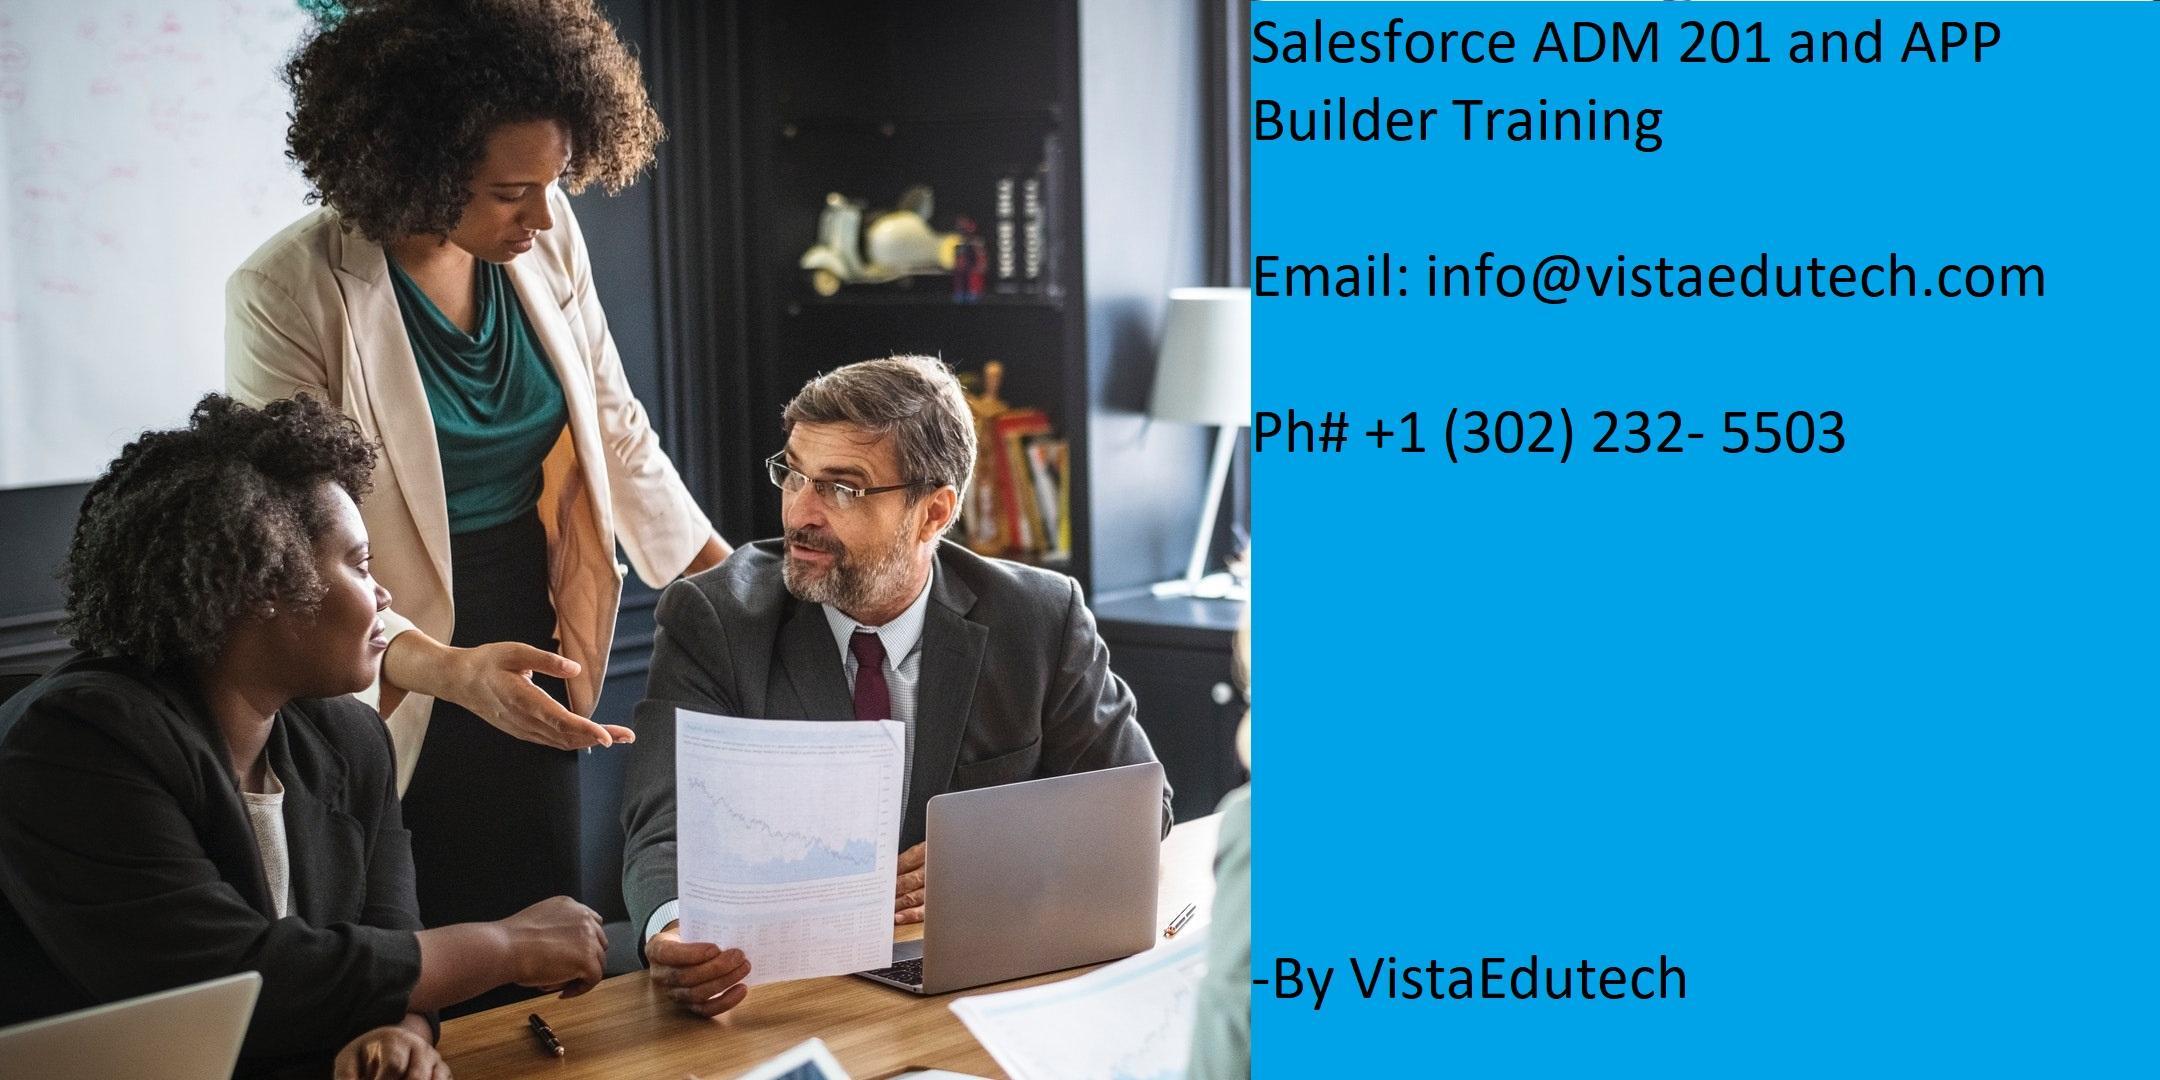 salesforce training certification adm dayton tn oh august dillon francis allevents pedal nashville eventbrite clarksville